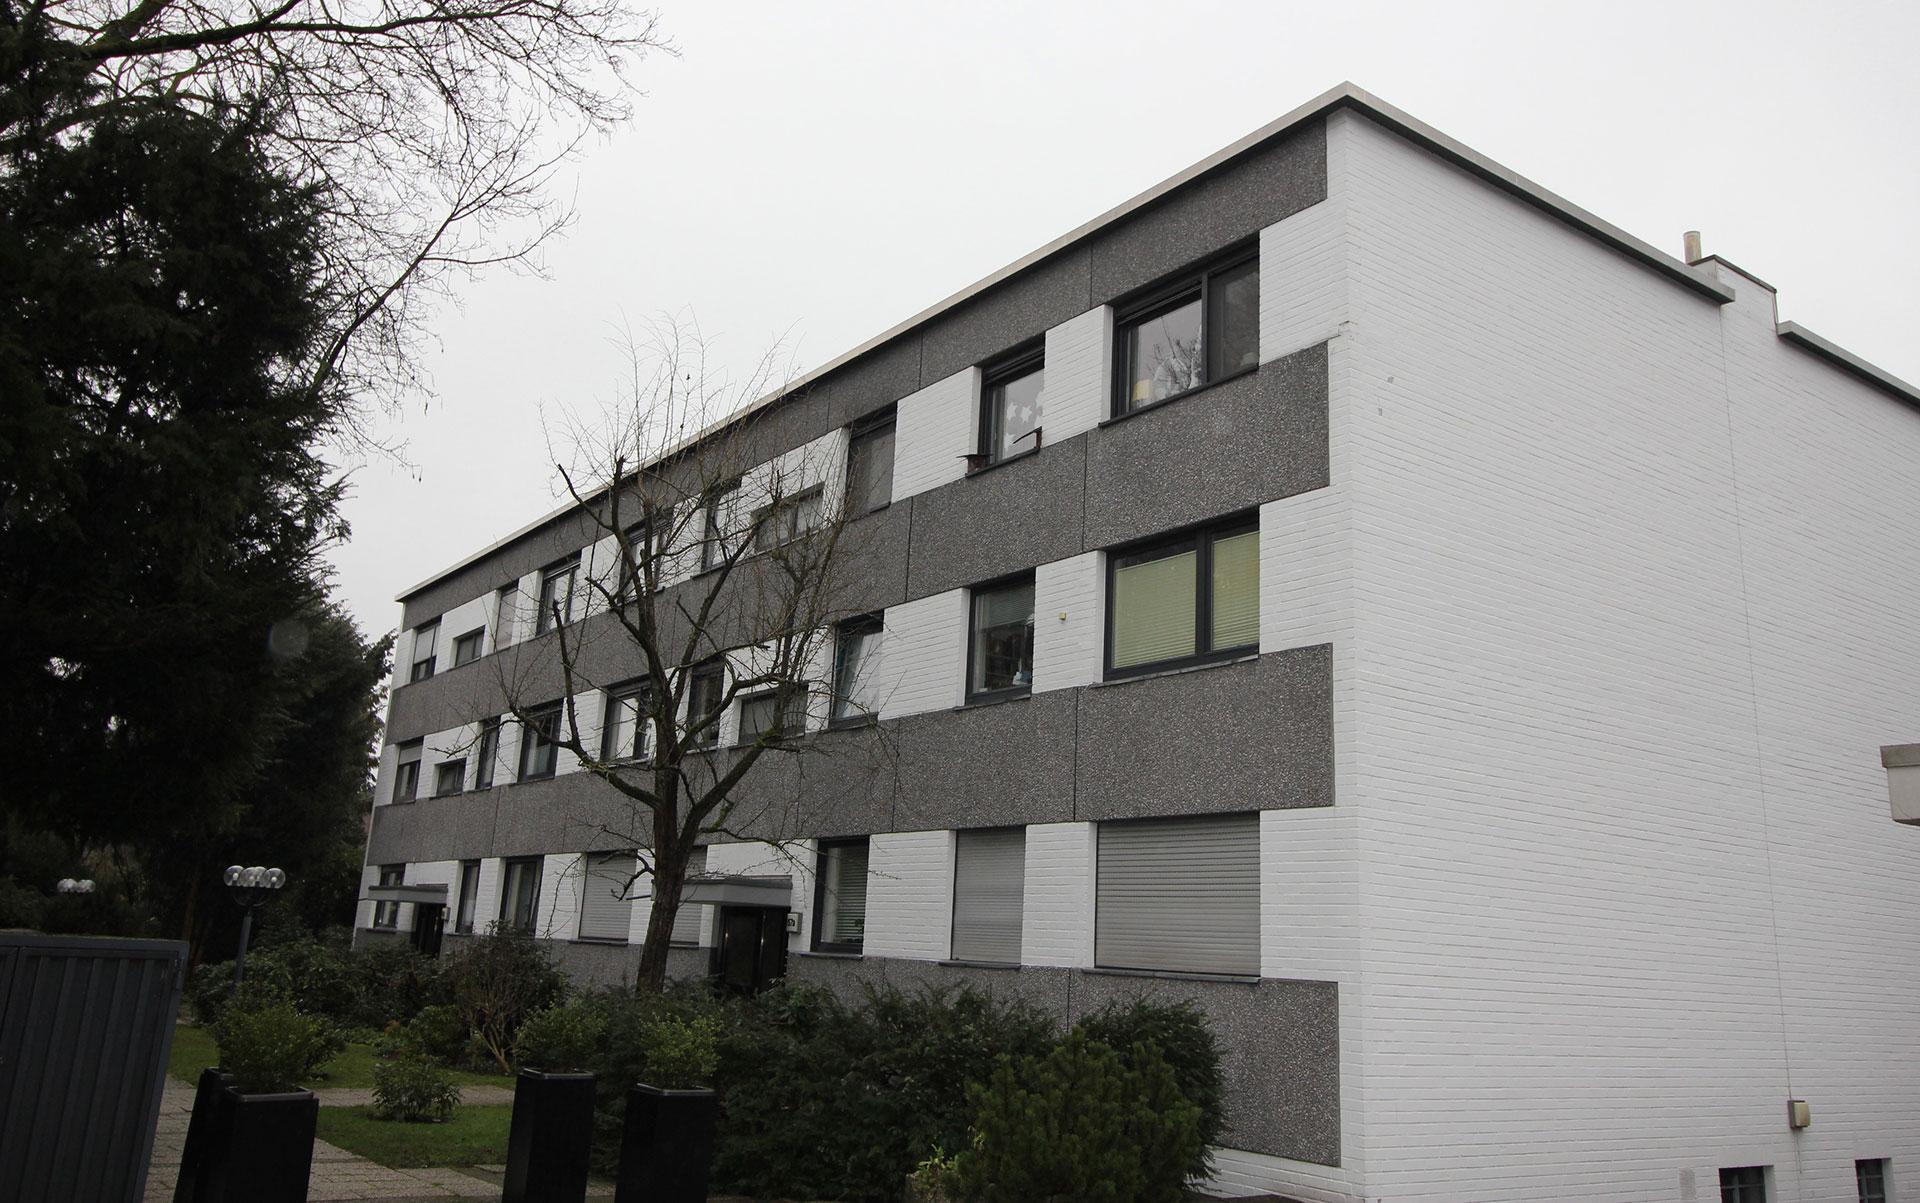 Hausverwaltung Krefeld: Grenzstraße WEG-Verwalter